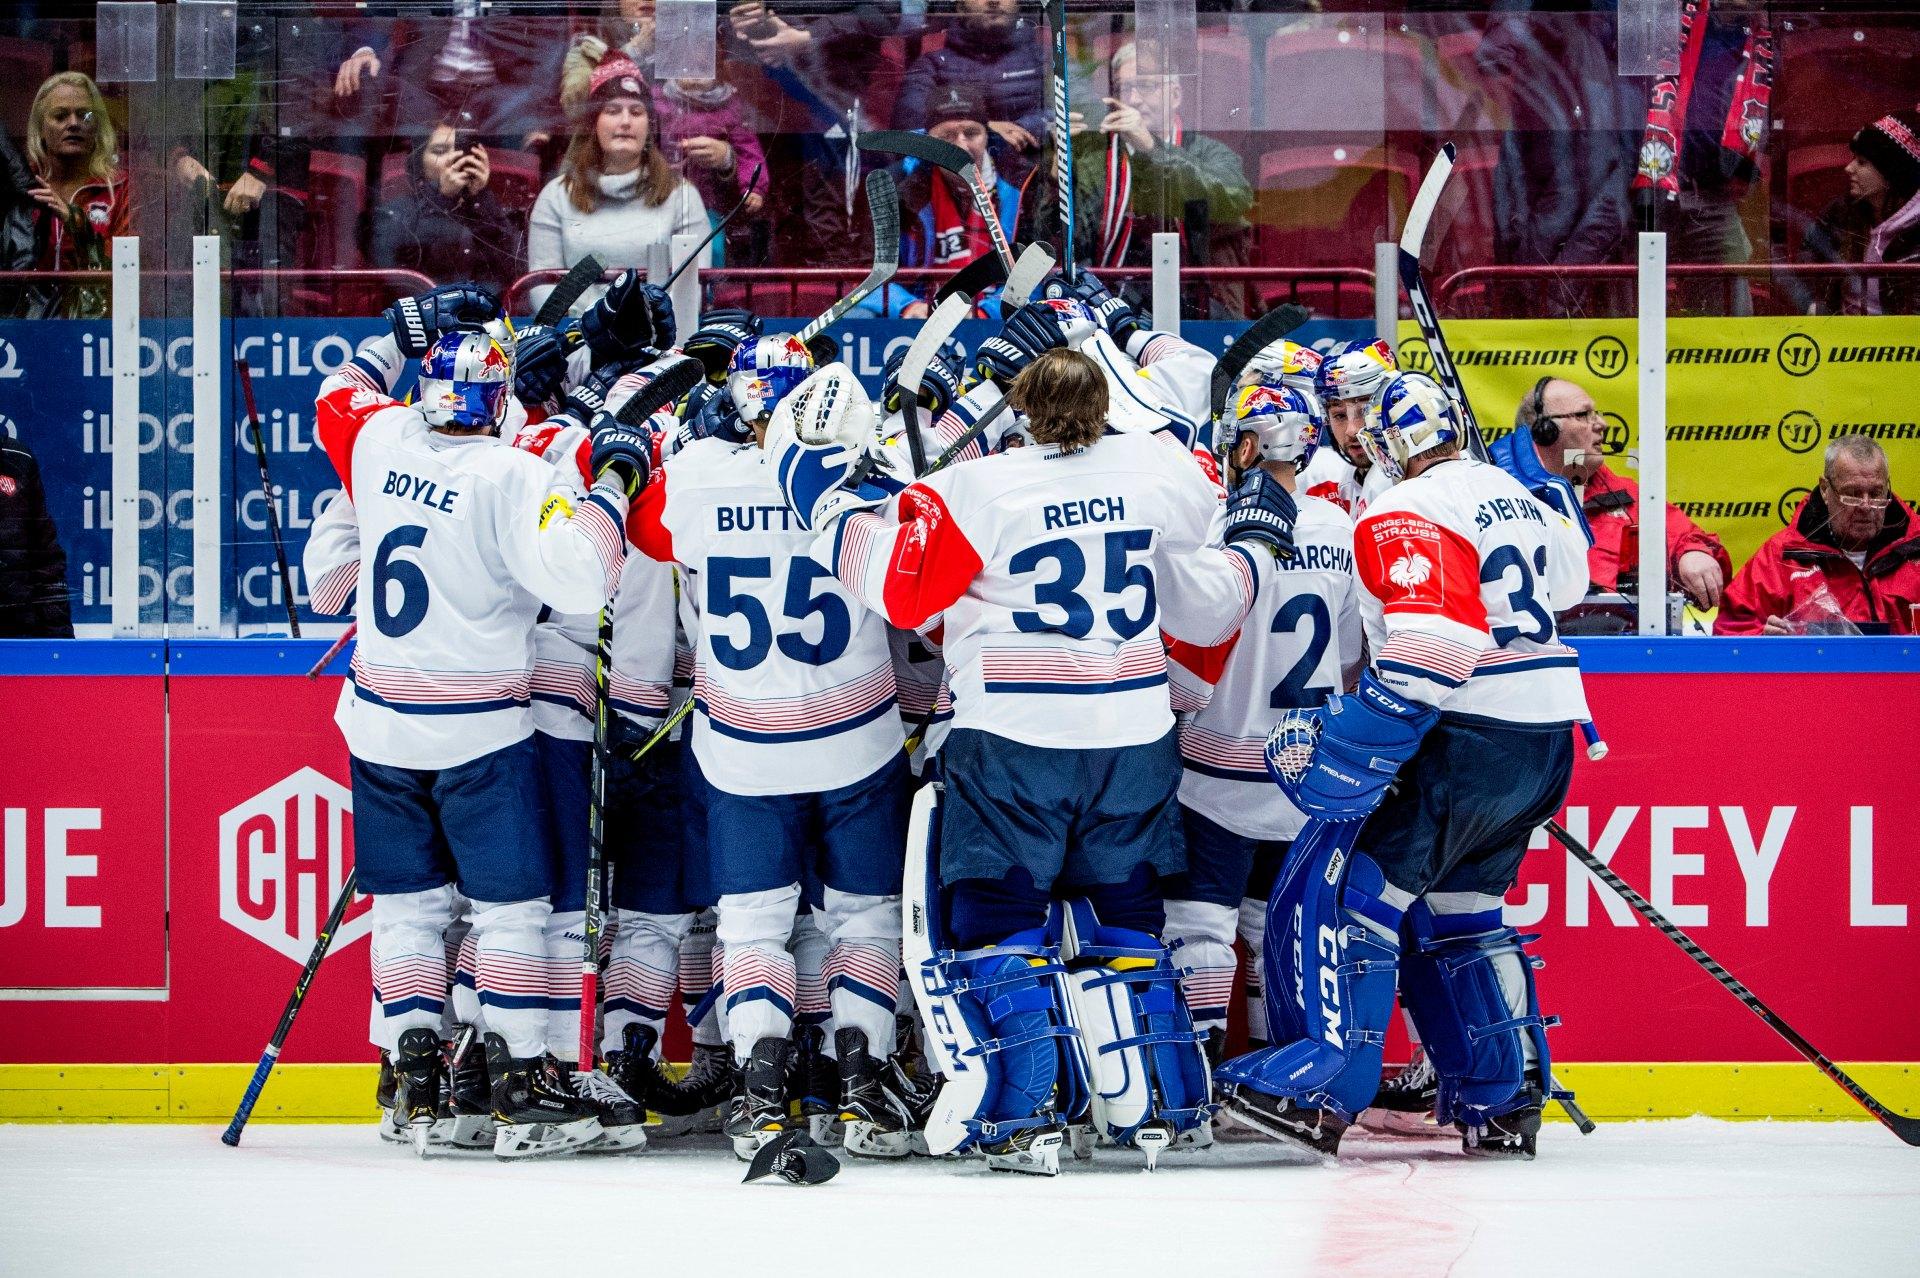 Champions Hockey League: EHC Red Bull München im Halbfinale